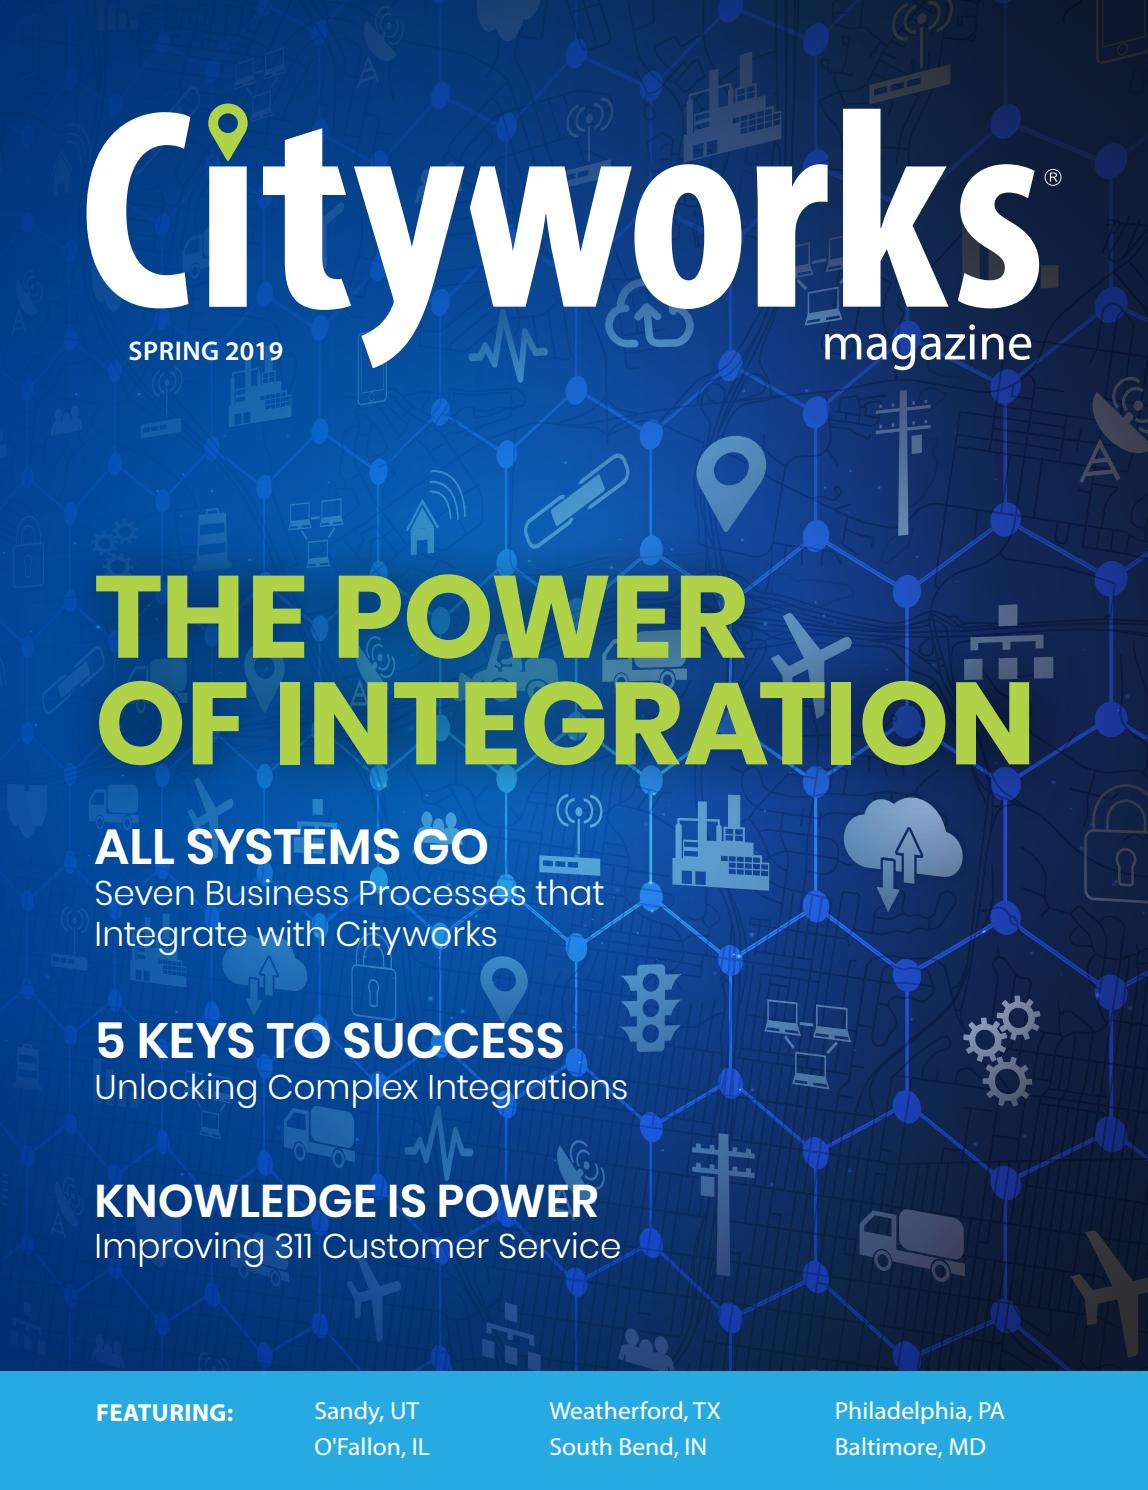 Cityworks Magazine Spring 2019 by Cityworks   Azteca Systems